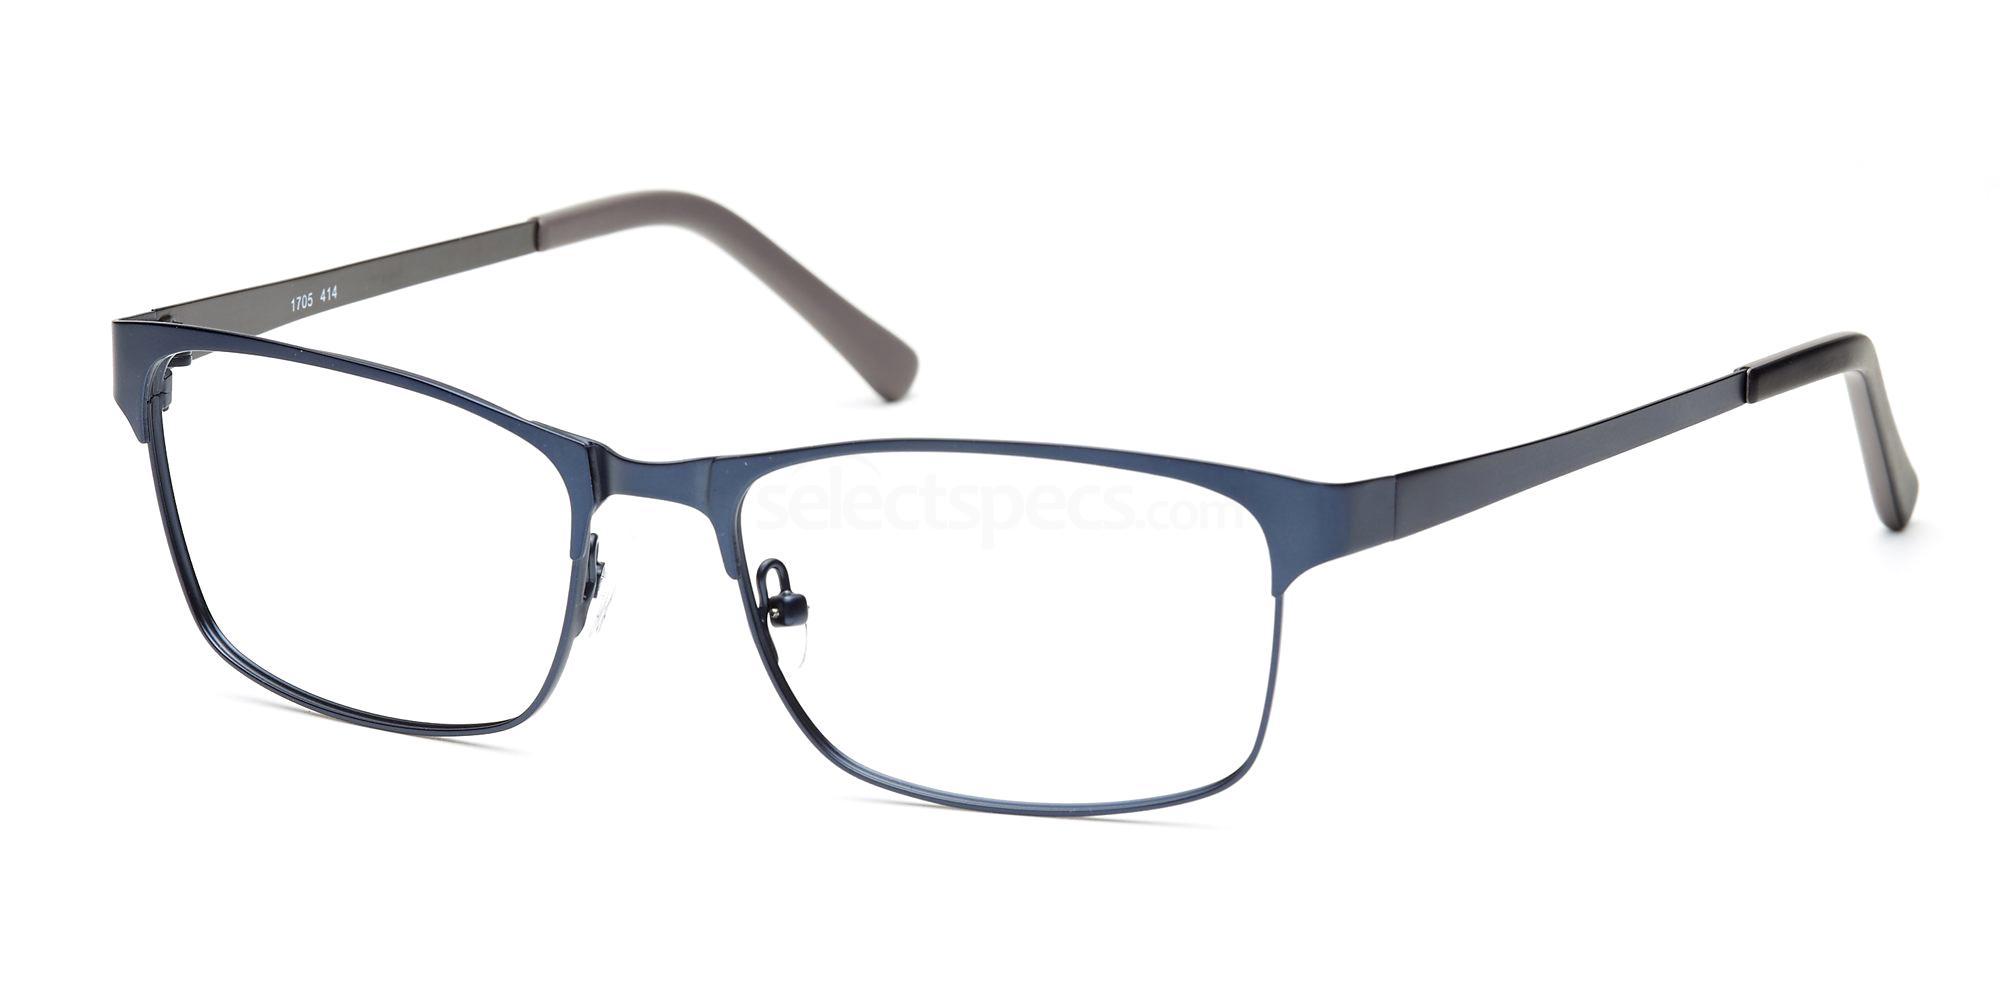 flextra titanium glasses flexible lightweight